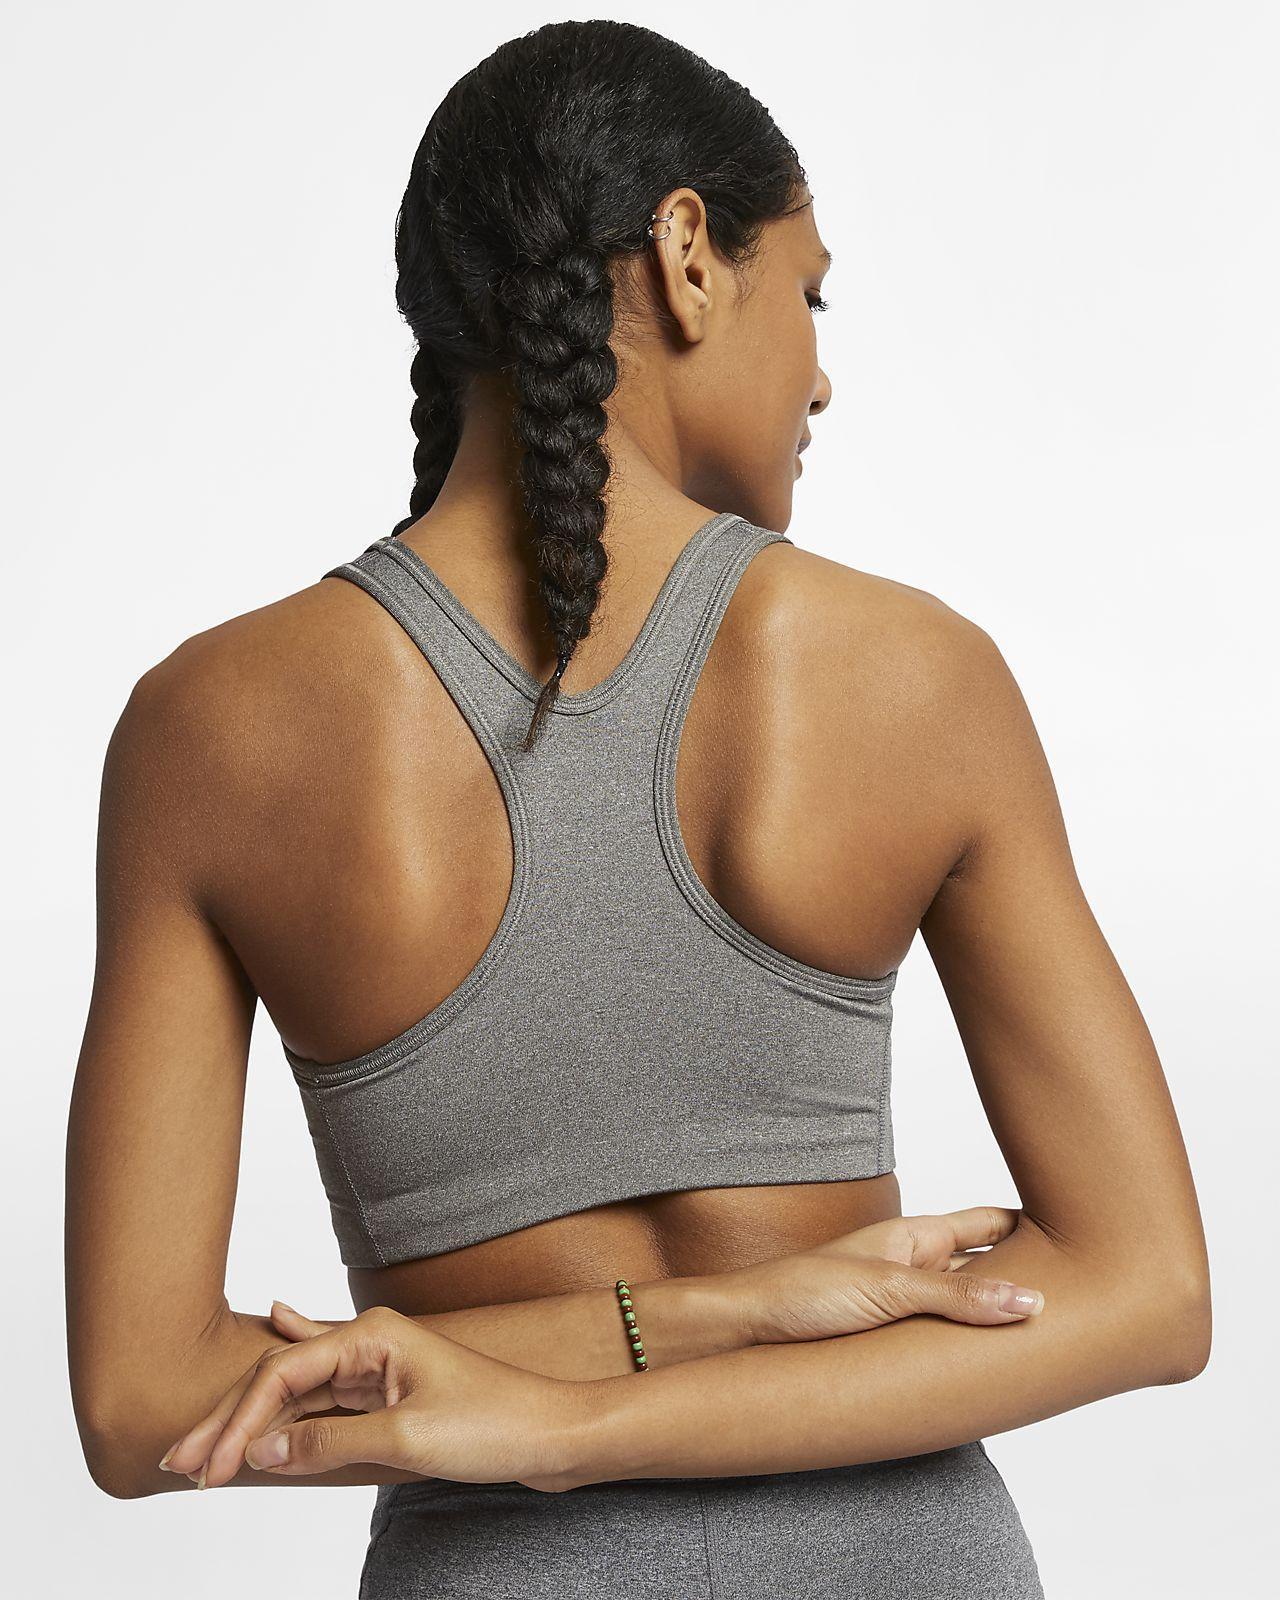 6456640ae79bd Nike Women s Swoosh Medium Support Sports Bra. Nike.com